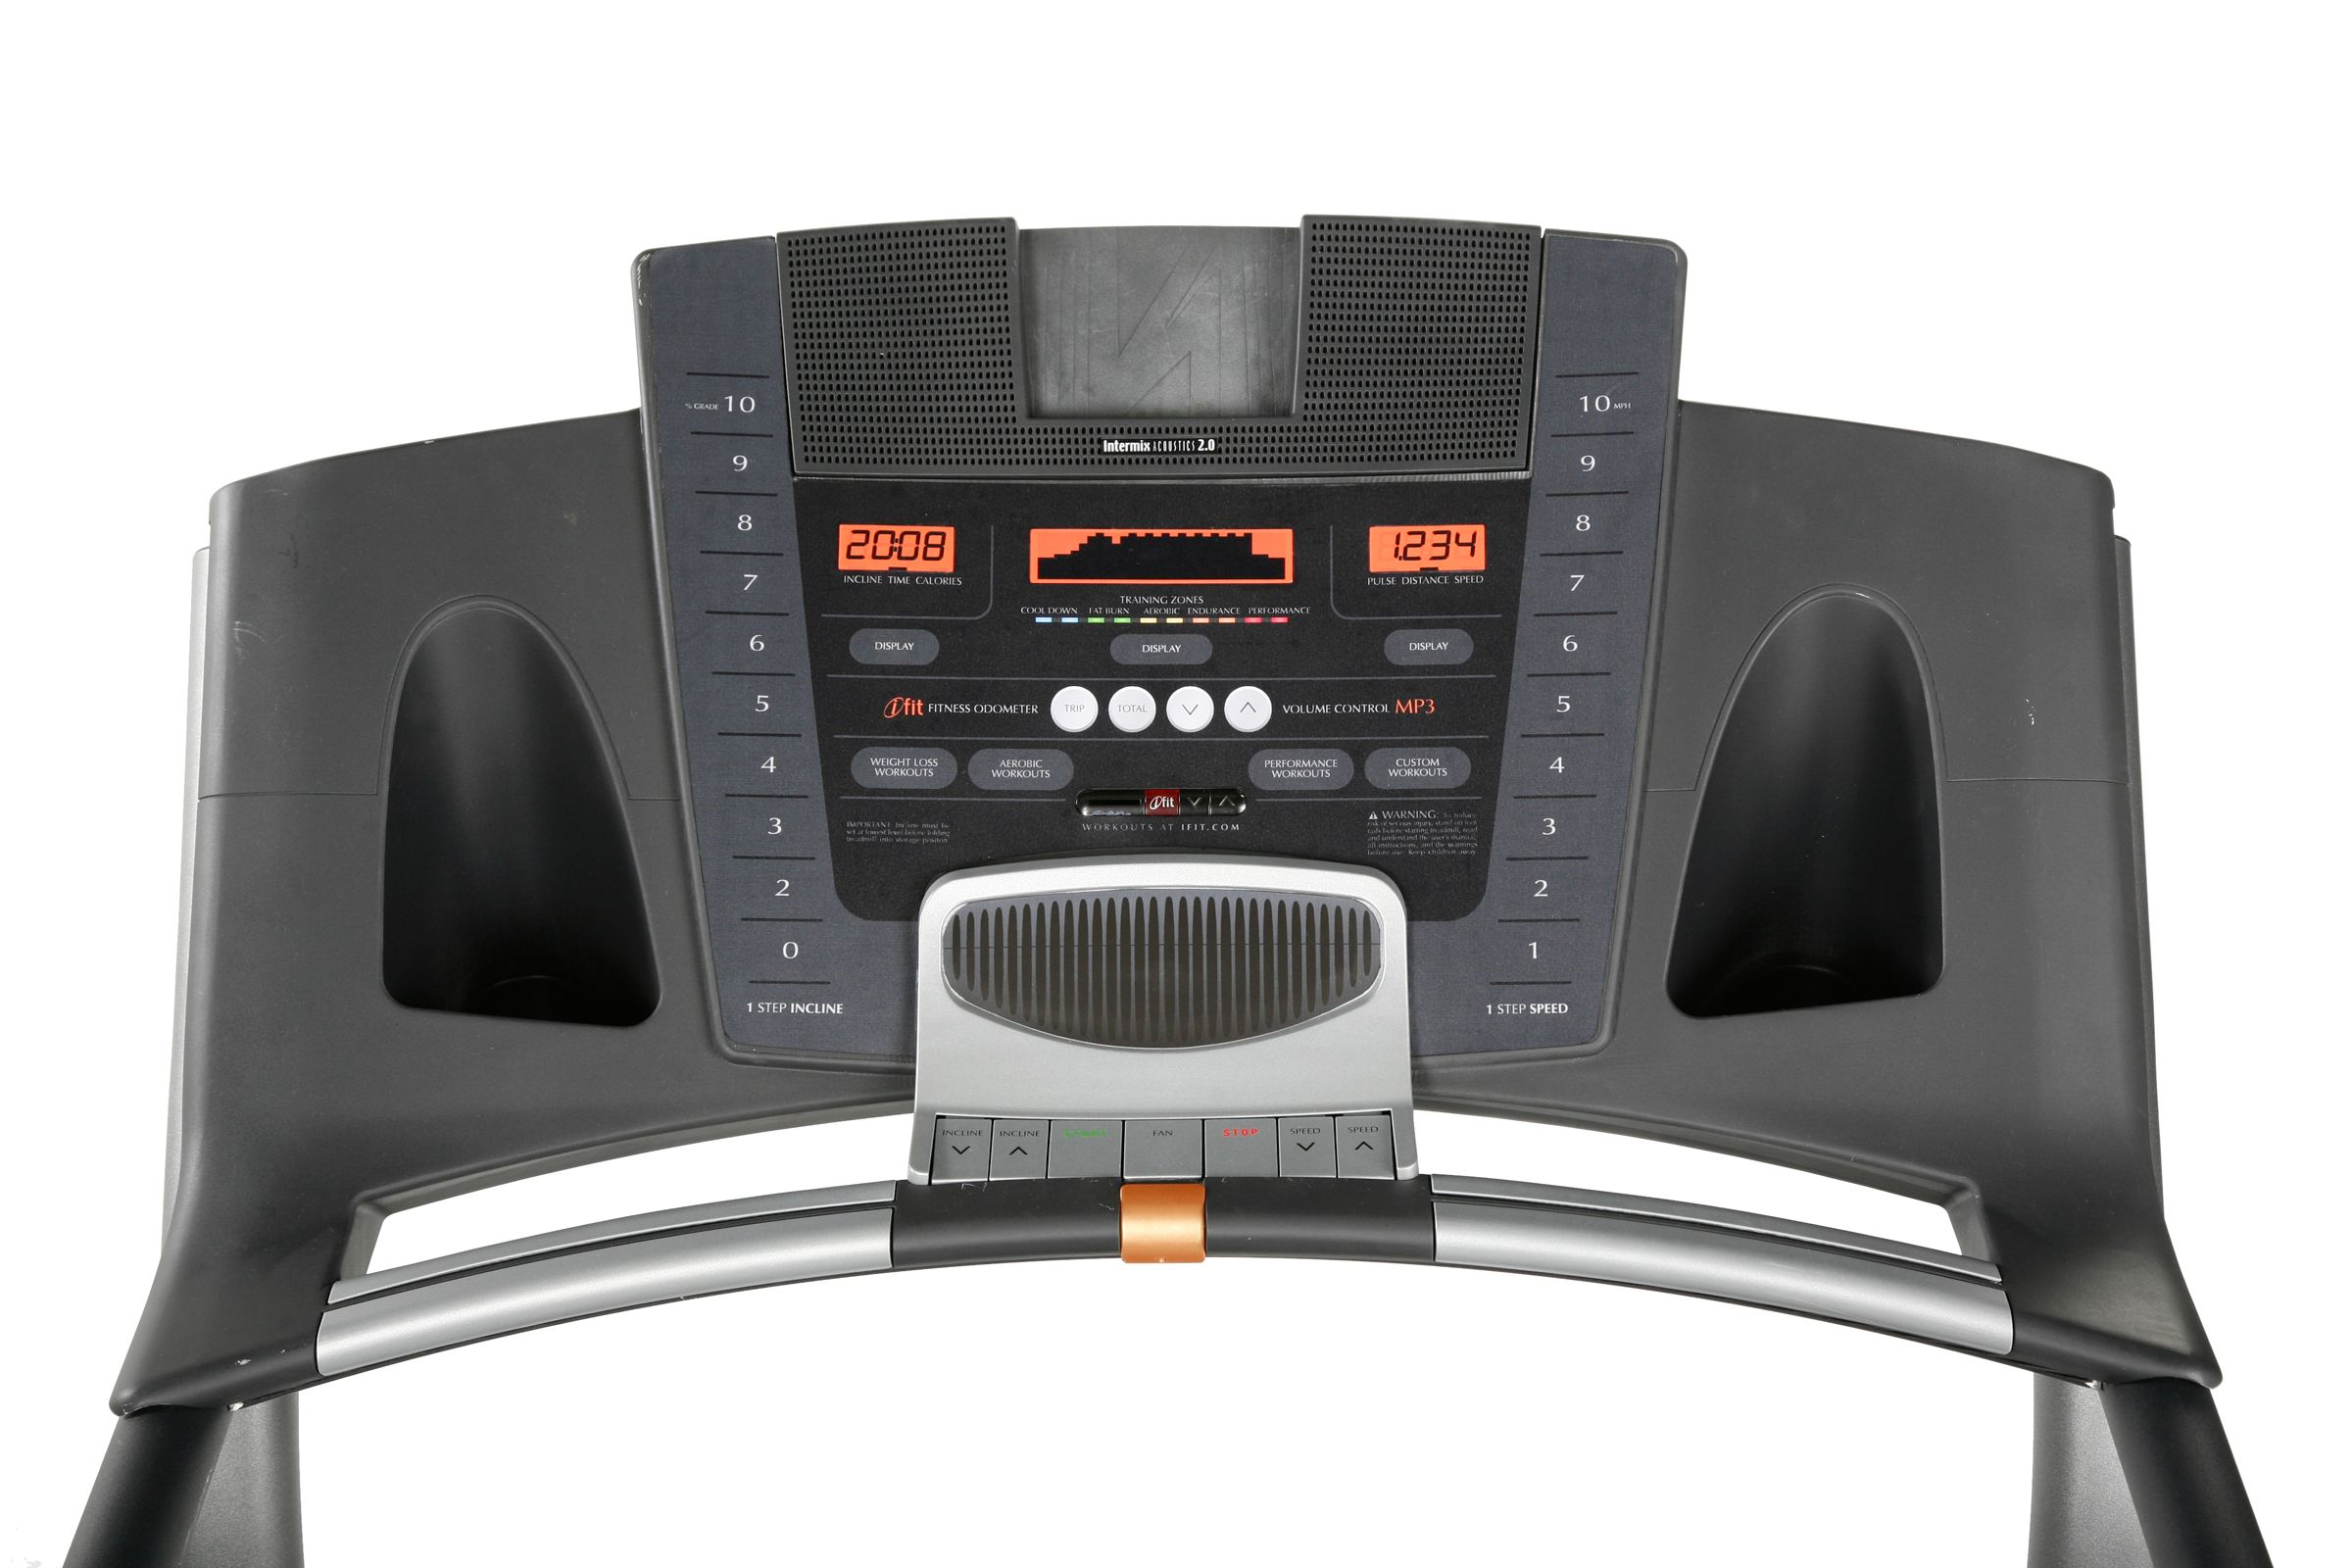 NordicTrack T7 si Treadmill